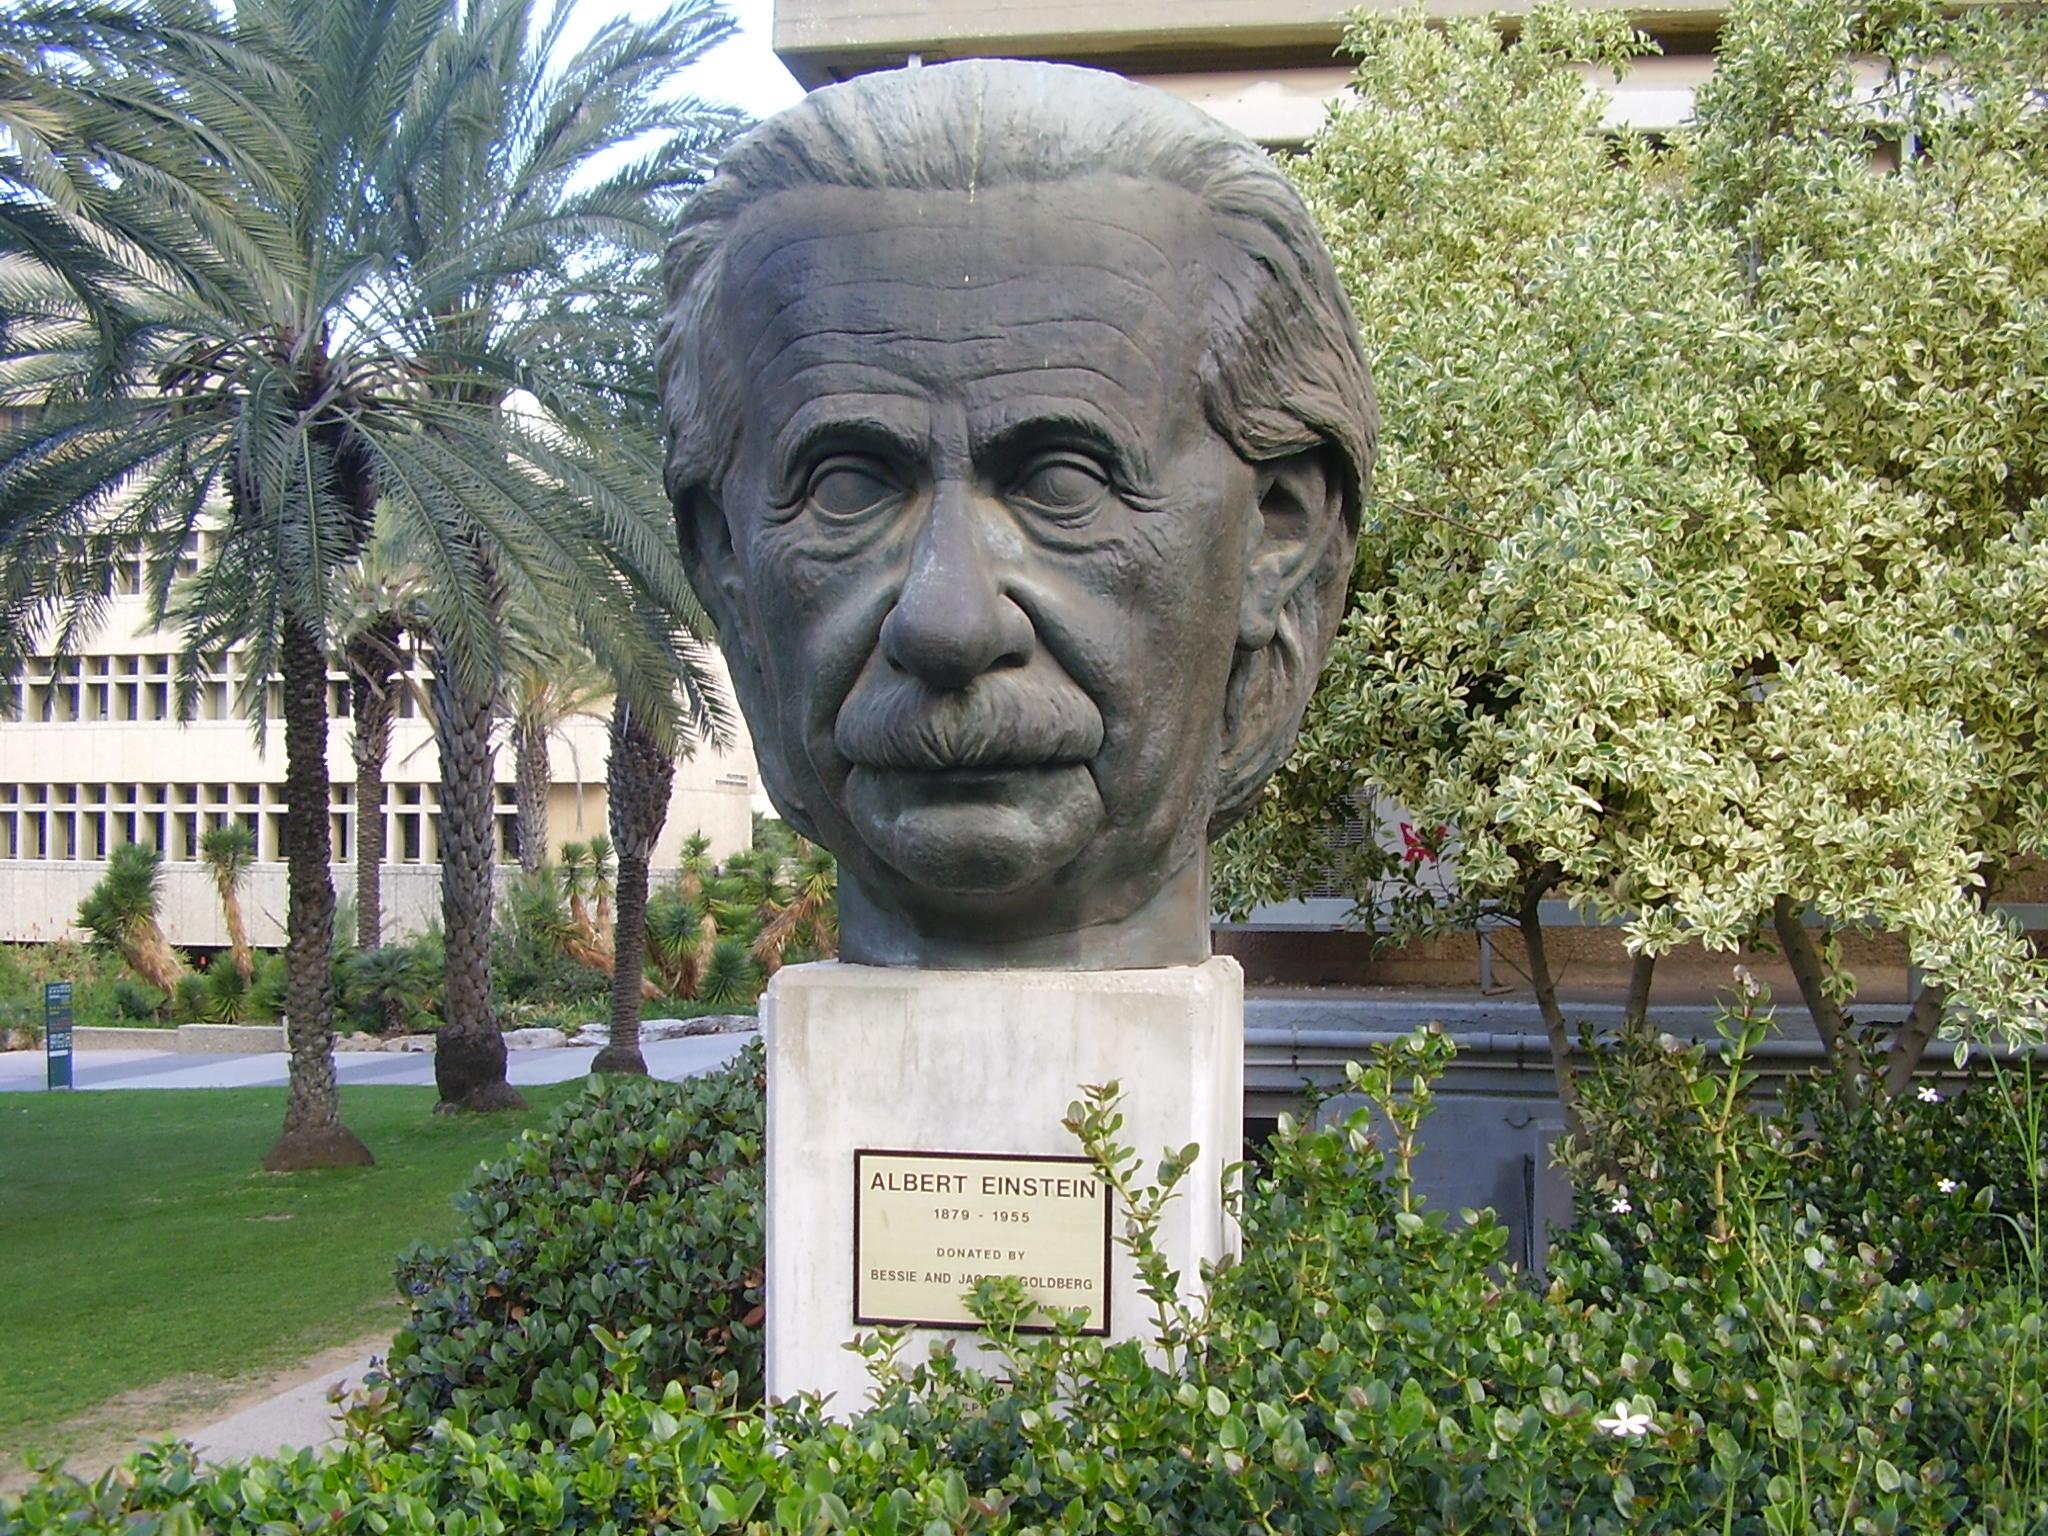 https://upload.wikimedia.org/wikipedia/commons/4/4f/PikiWiki_Israel_6868_statue_of_albert_einstein.jpg